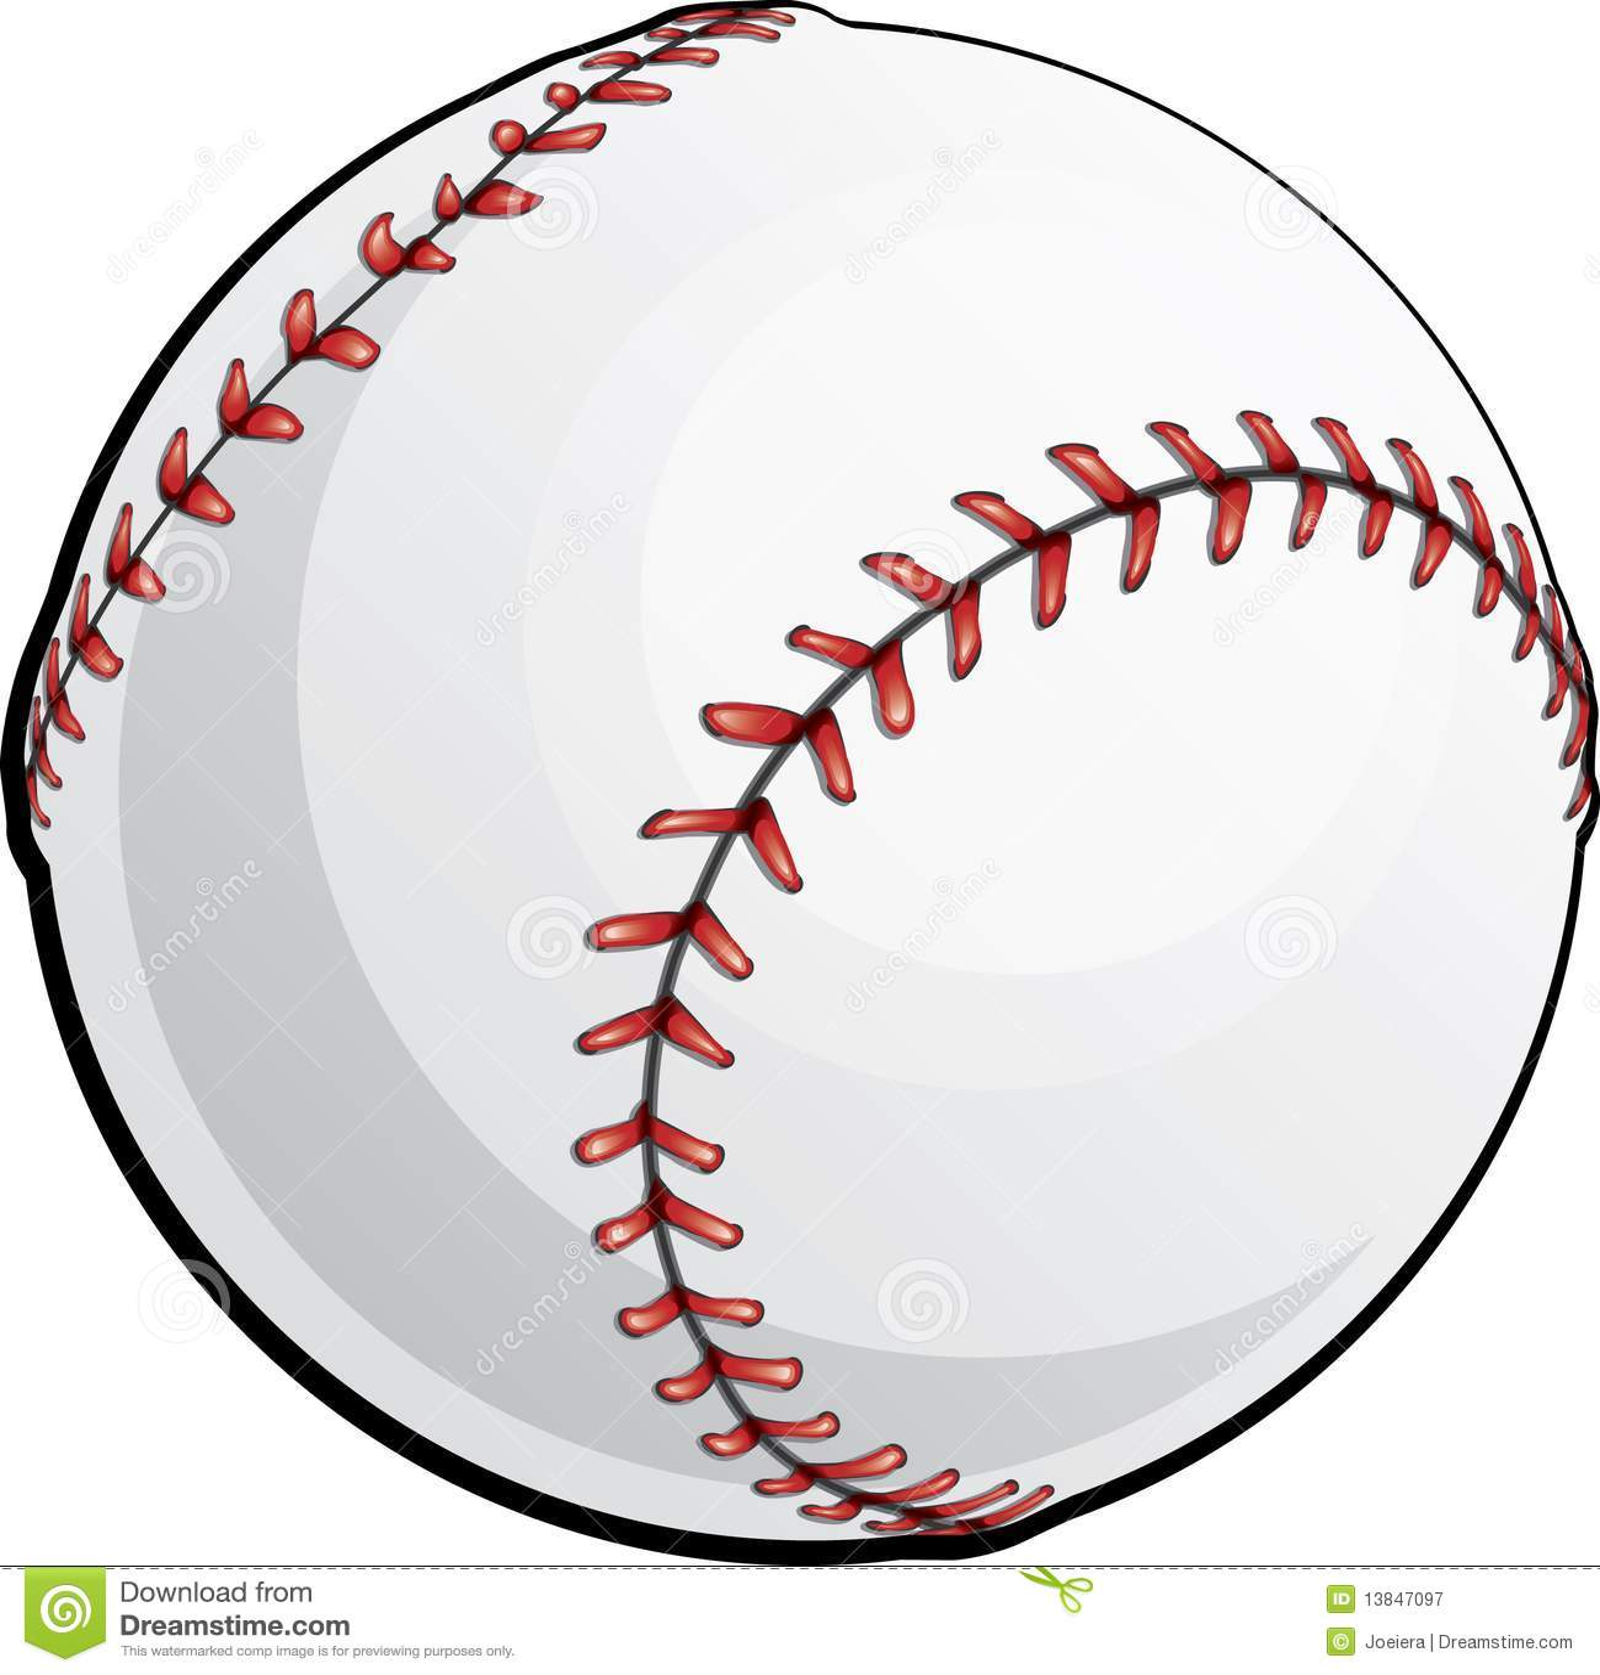 baseball royalty free stock photography image 13847097 free clipart softball batter clip art softball bat